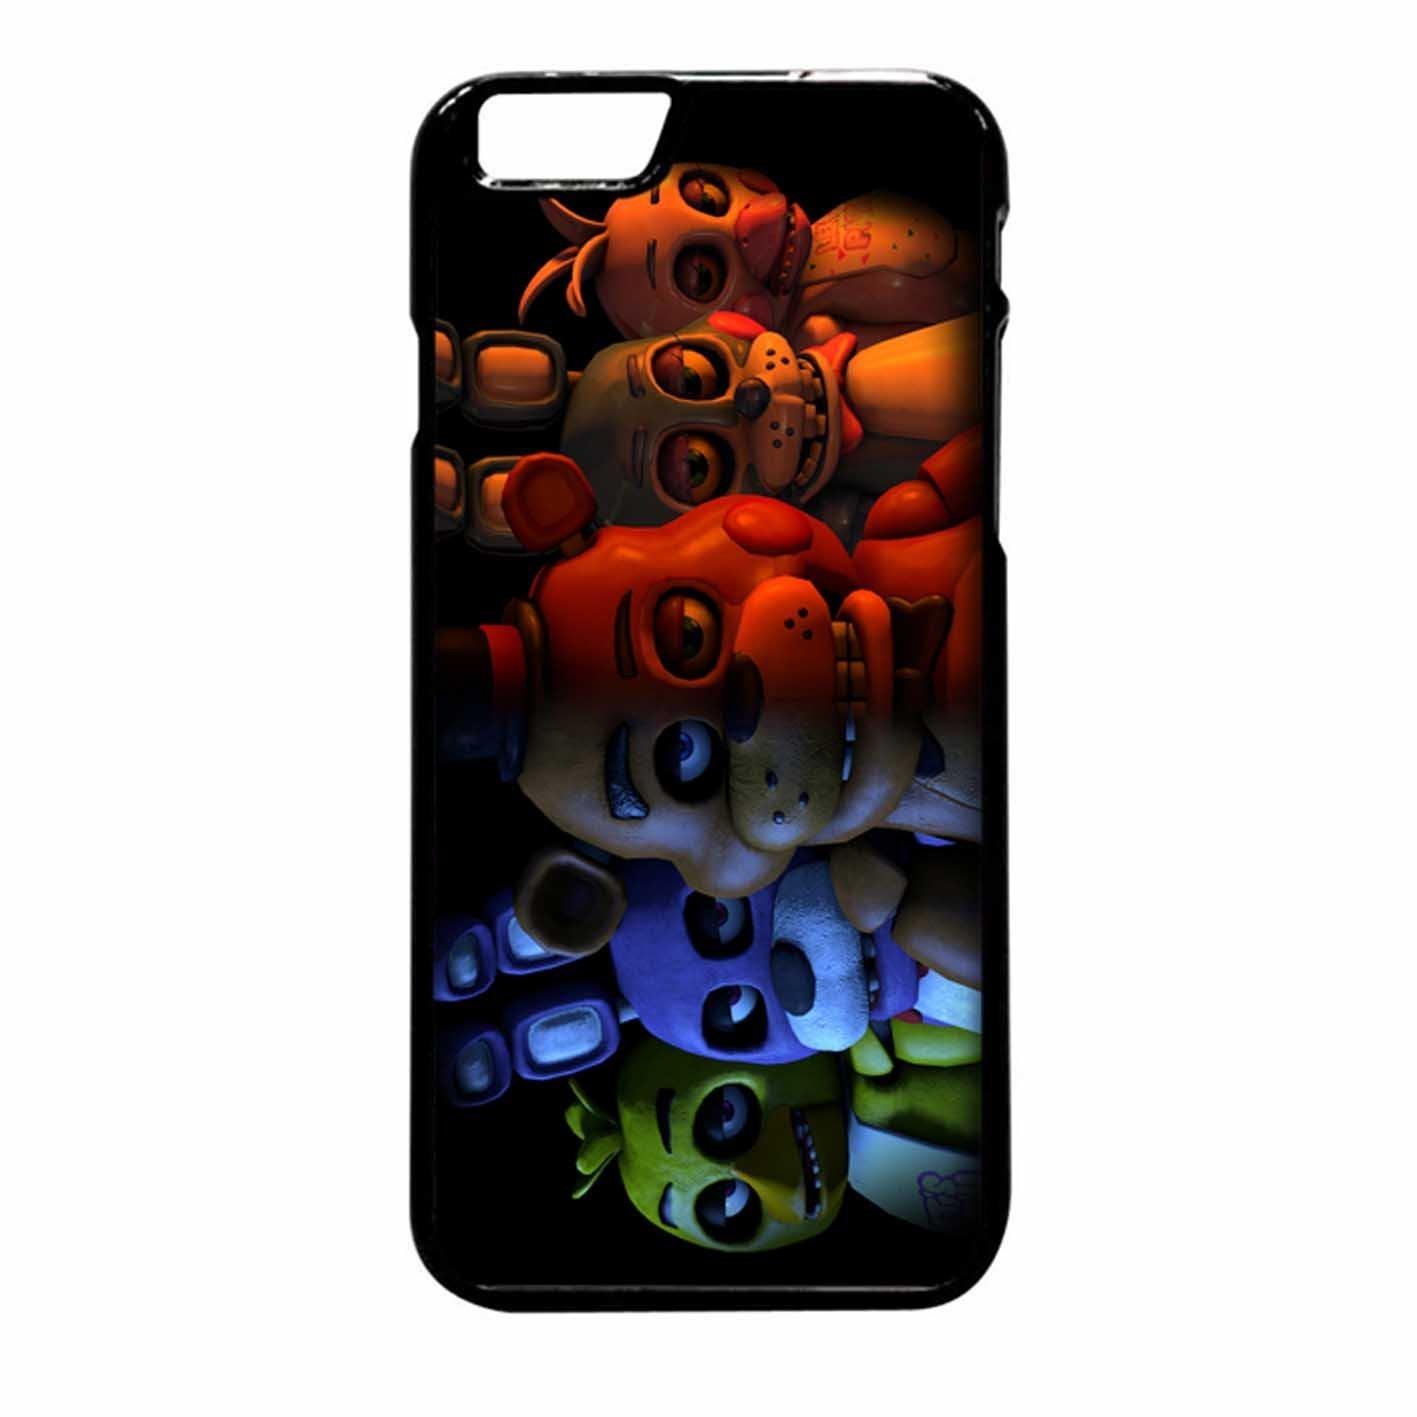 Amazon.com  Five Nights At Freddy Case   Color Black Rubber   Device iPhone  6 Plus 6s Plus  Cell Phones   Accessories 43d3e6cb6f0